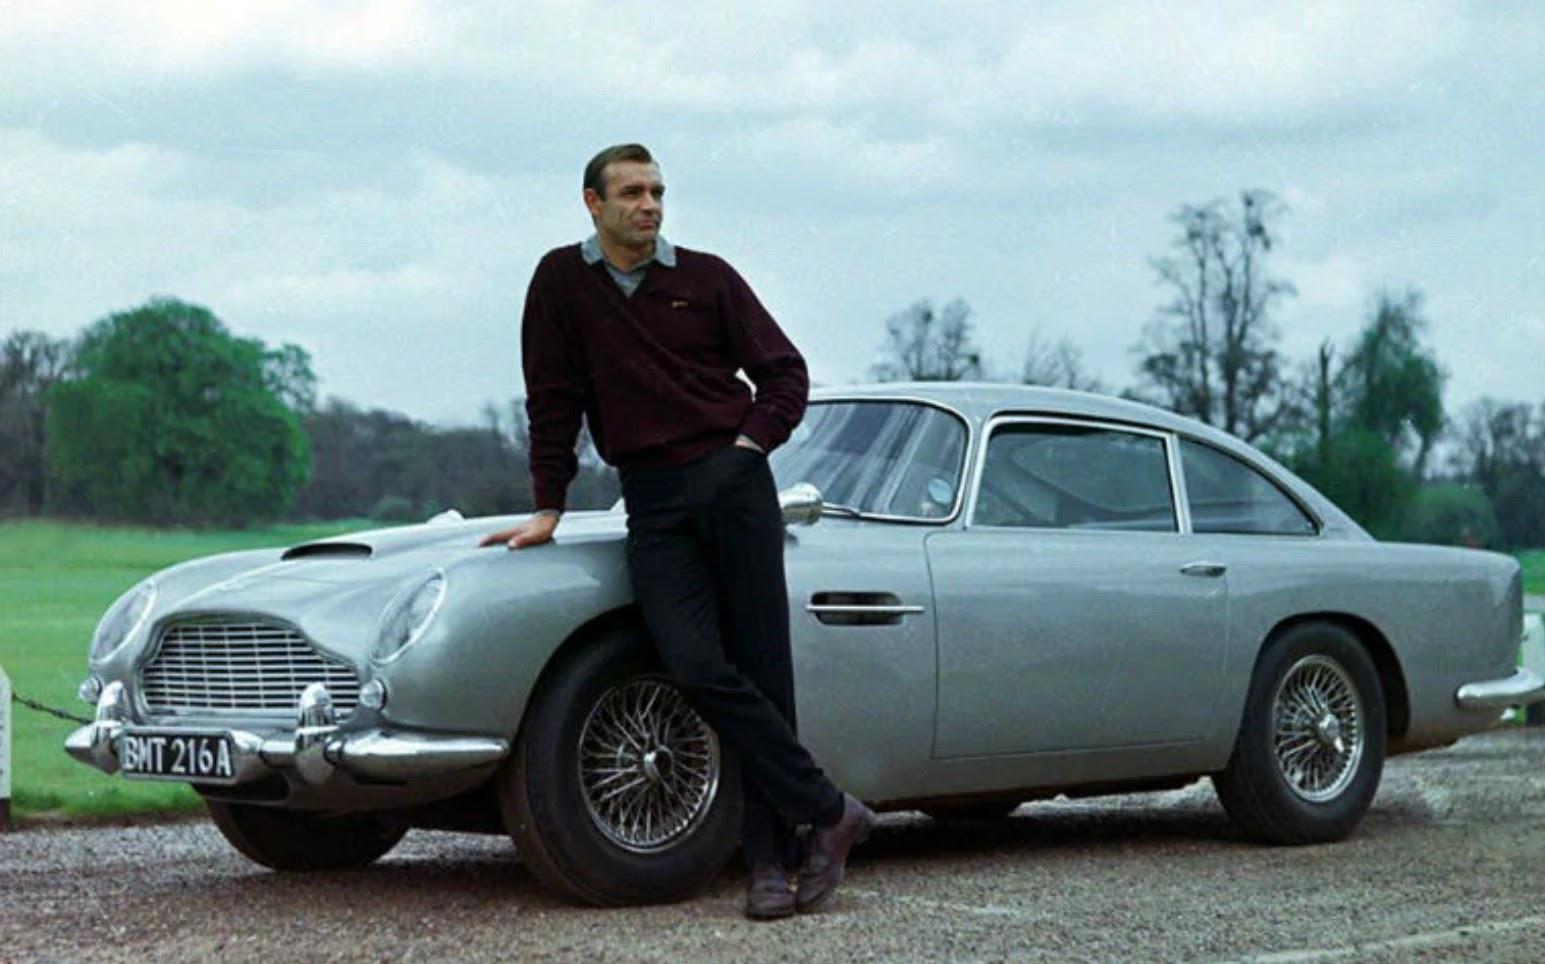 Sean Connery, starring as James Bond